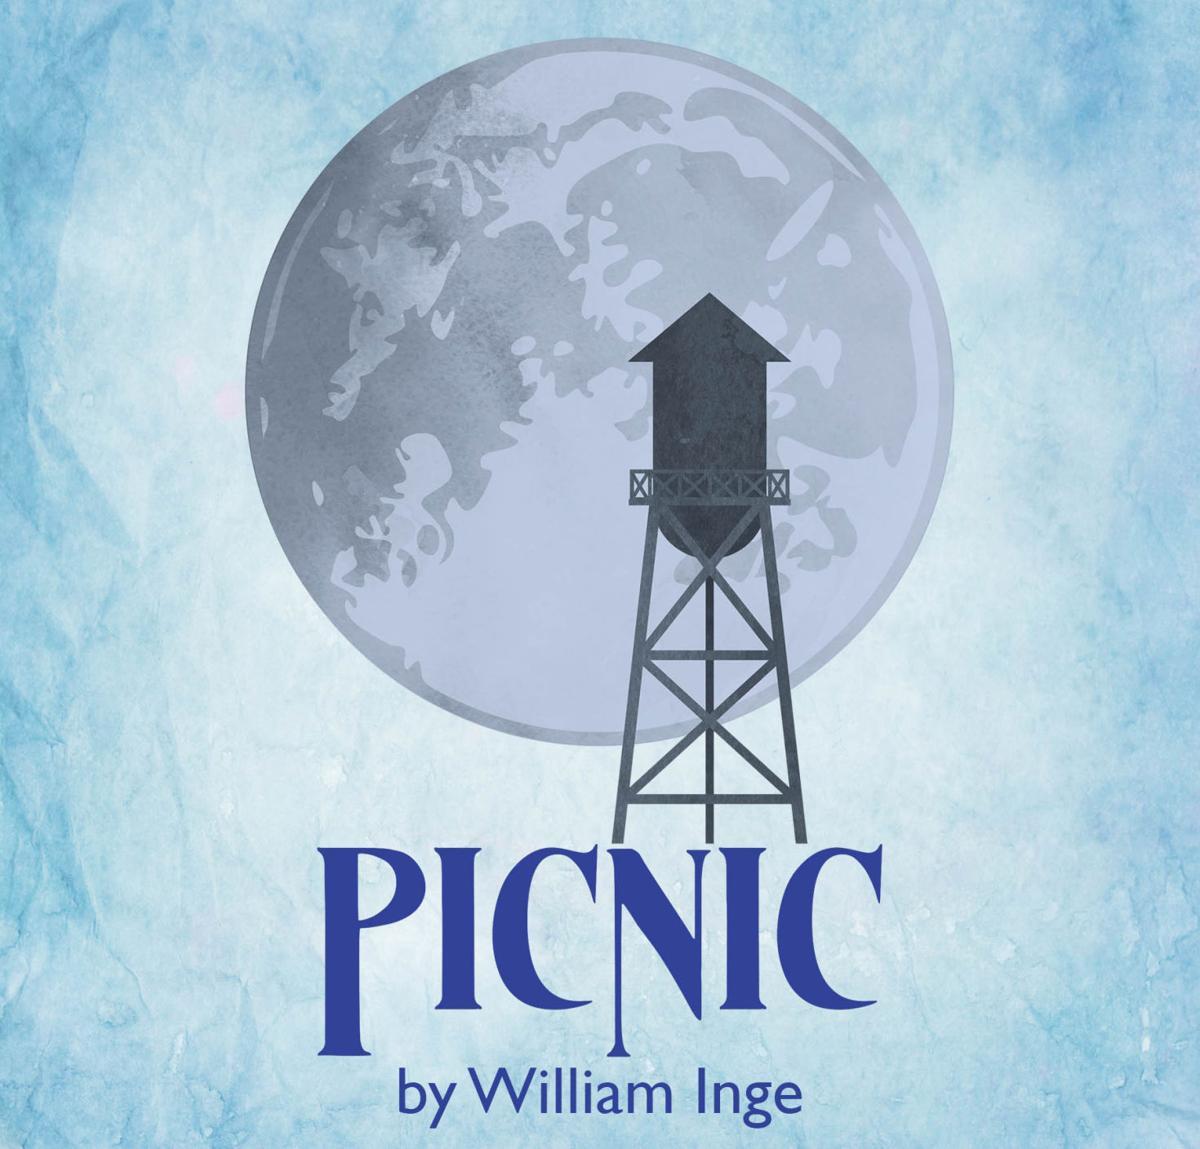 picnic_sq copy.jpg